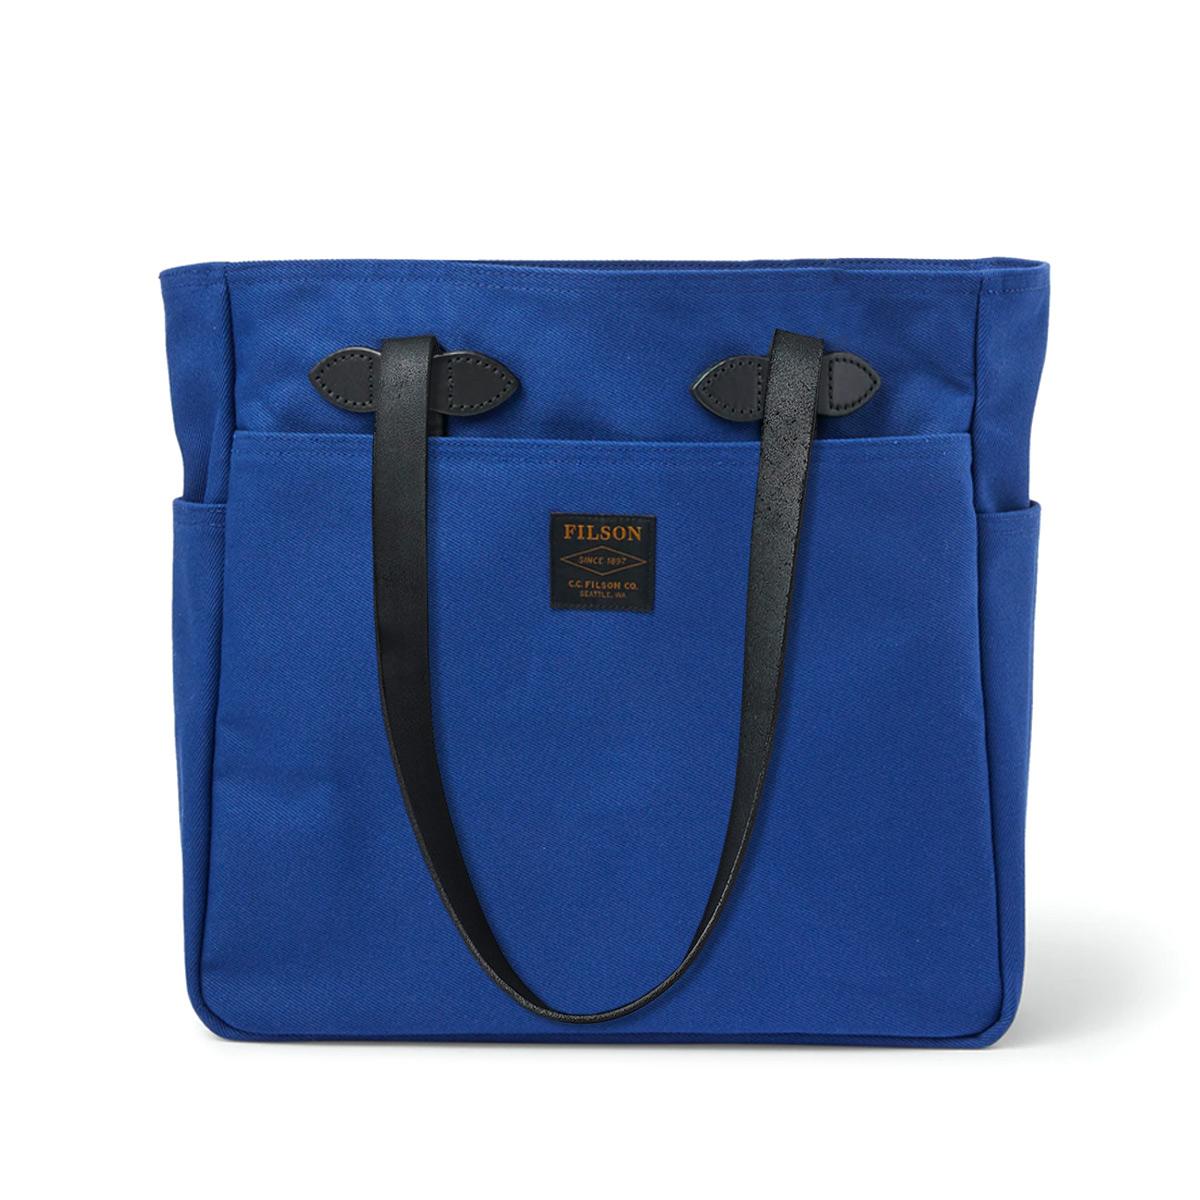 Filson Rugged Twill Tote Bag 20189186-Flag Blue